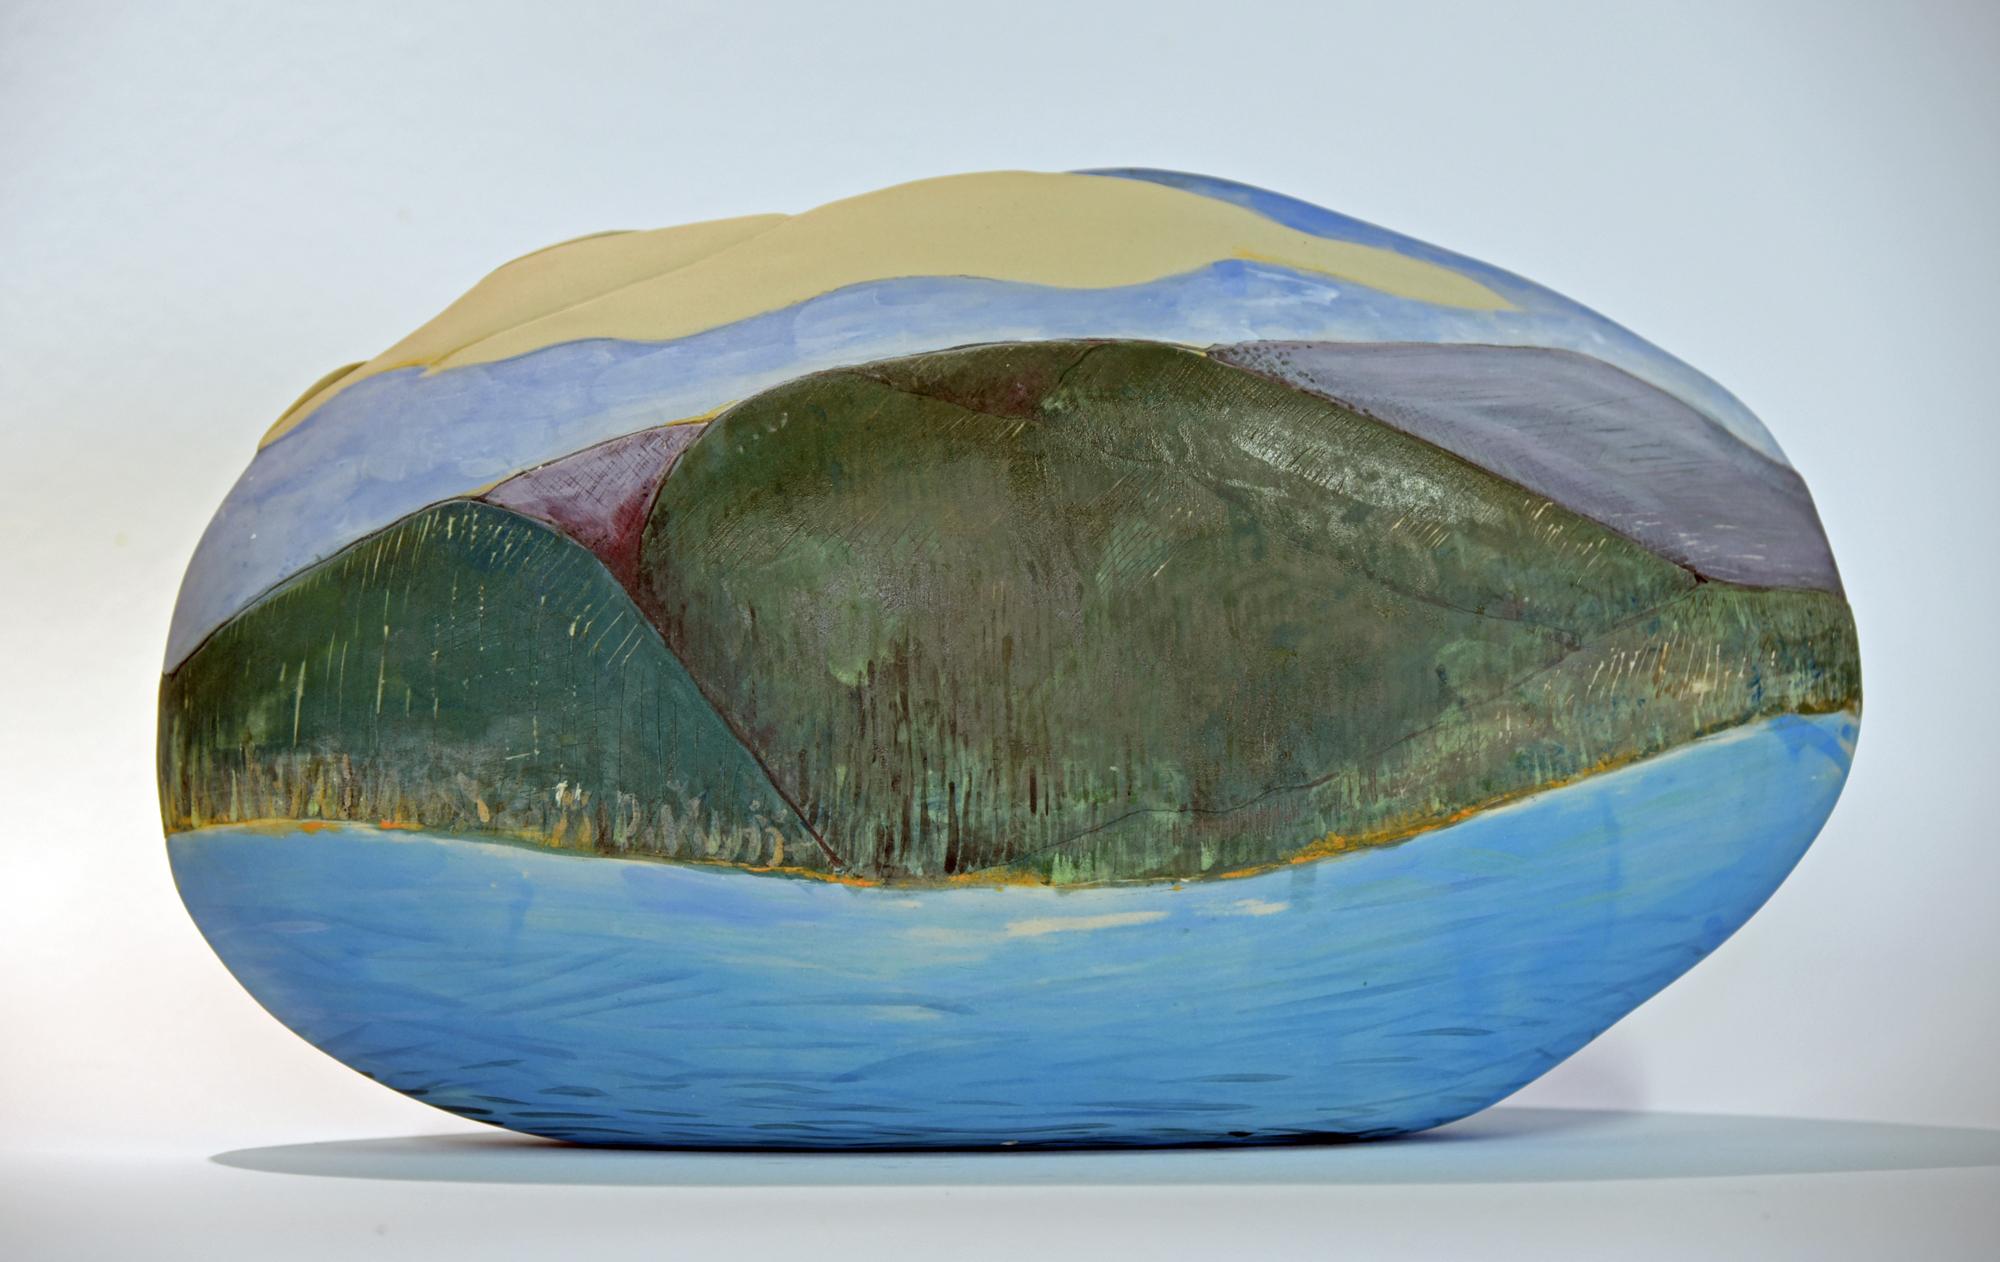 Land/seascape vessel